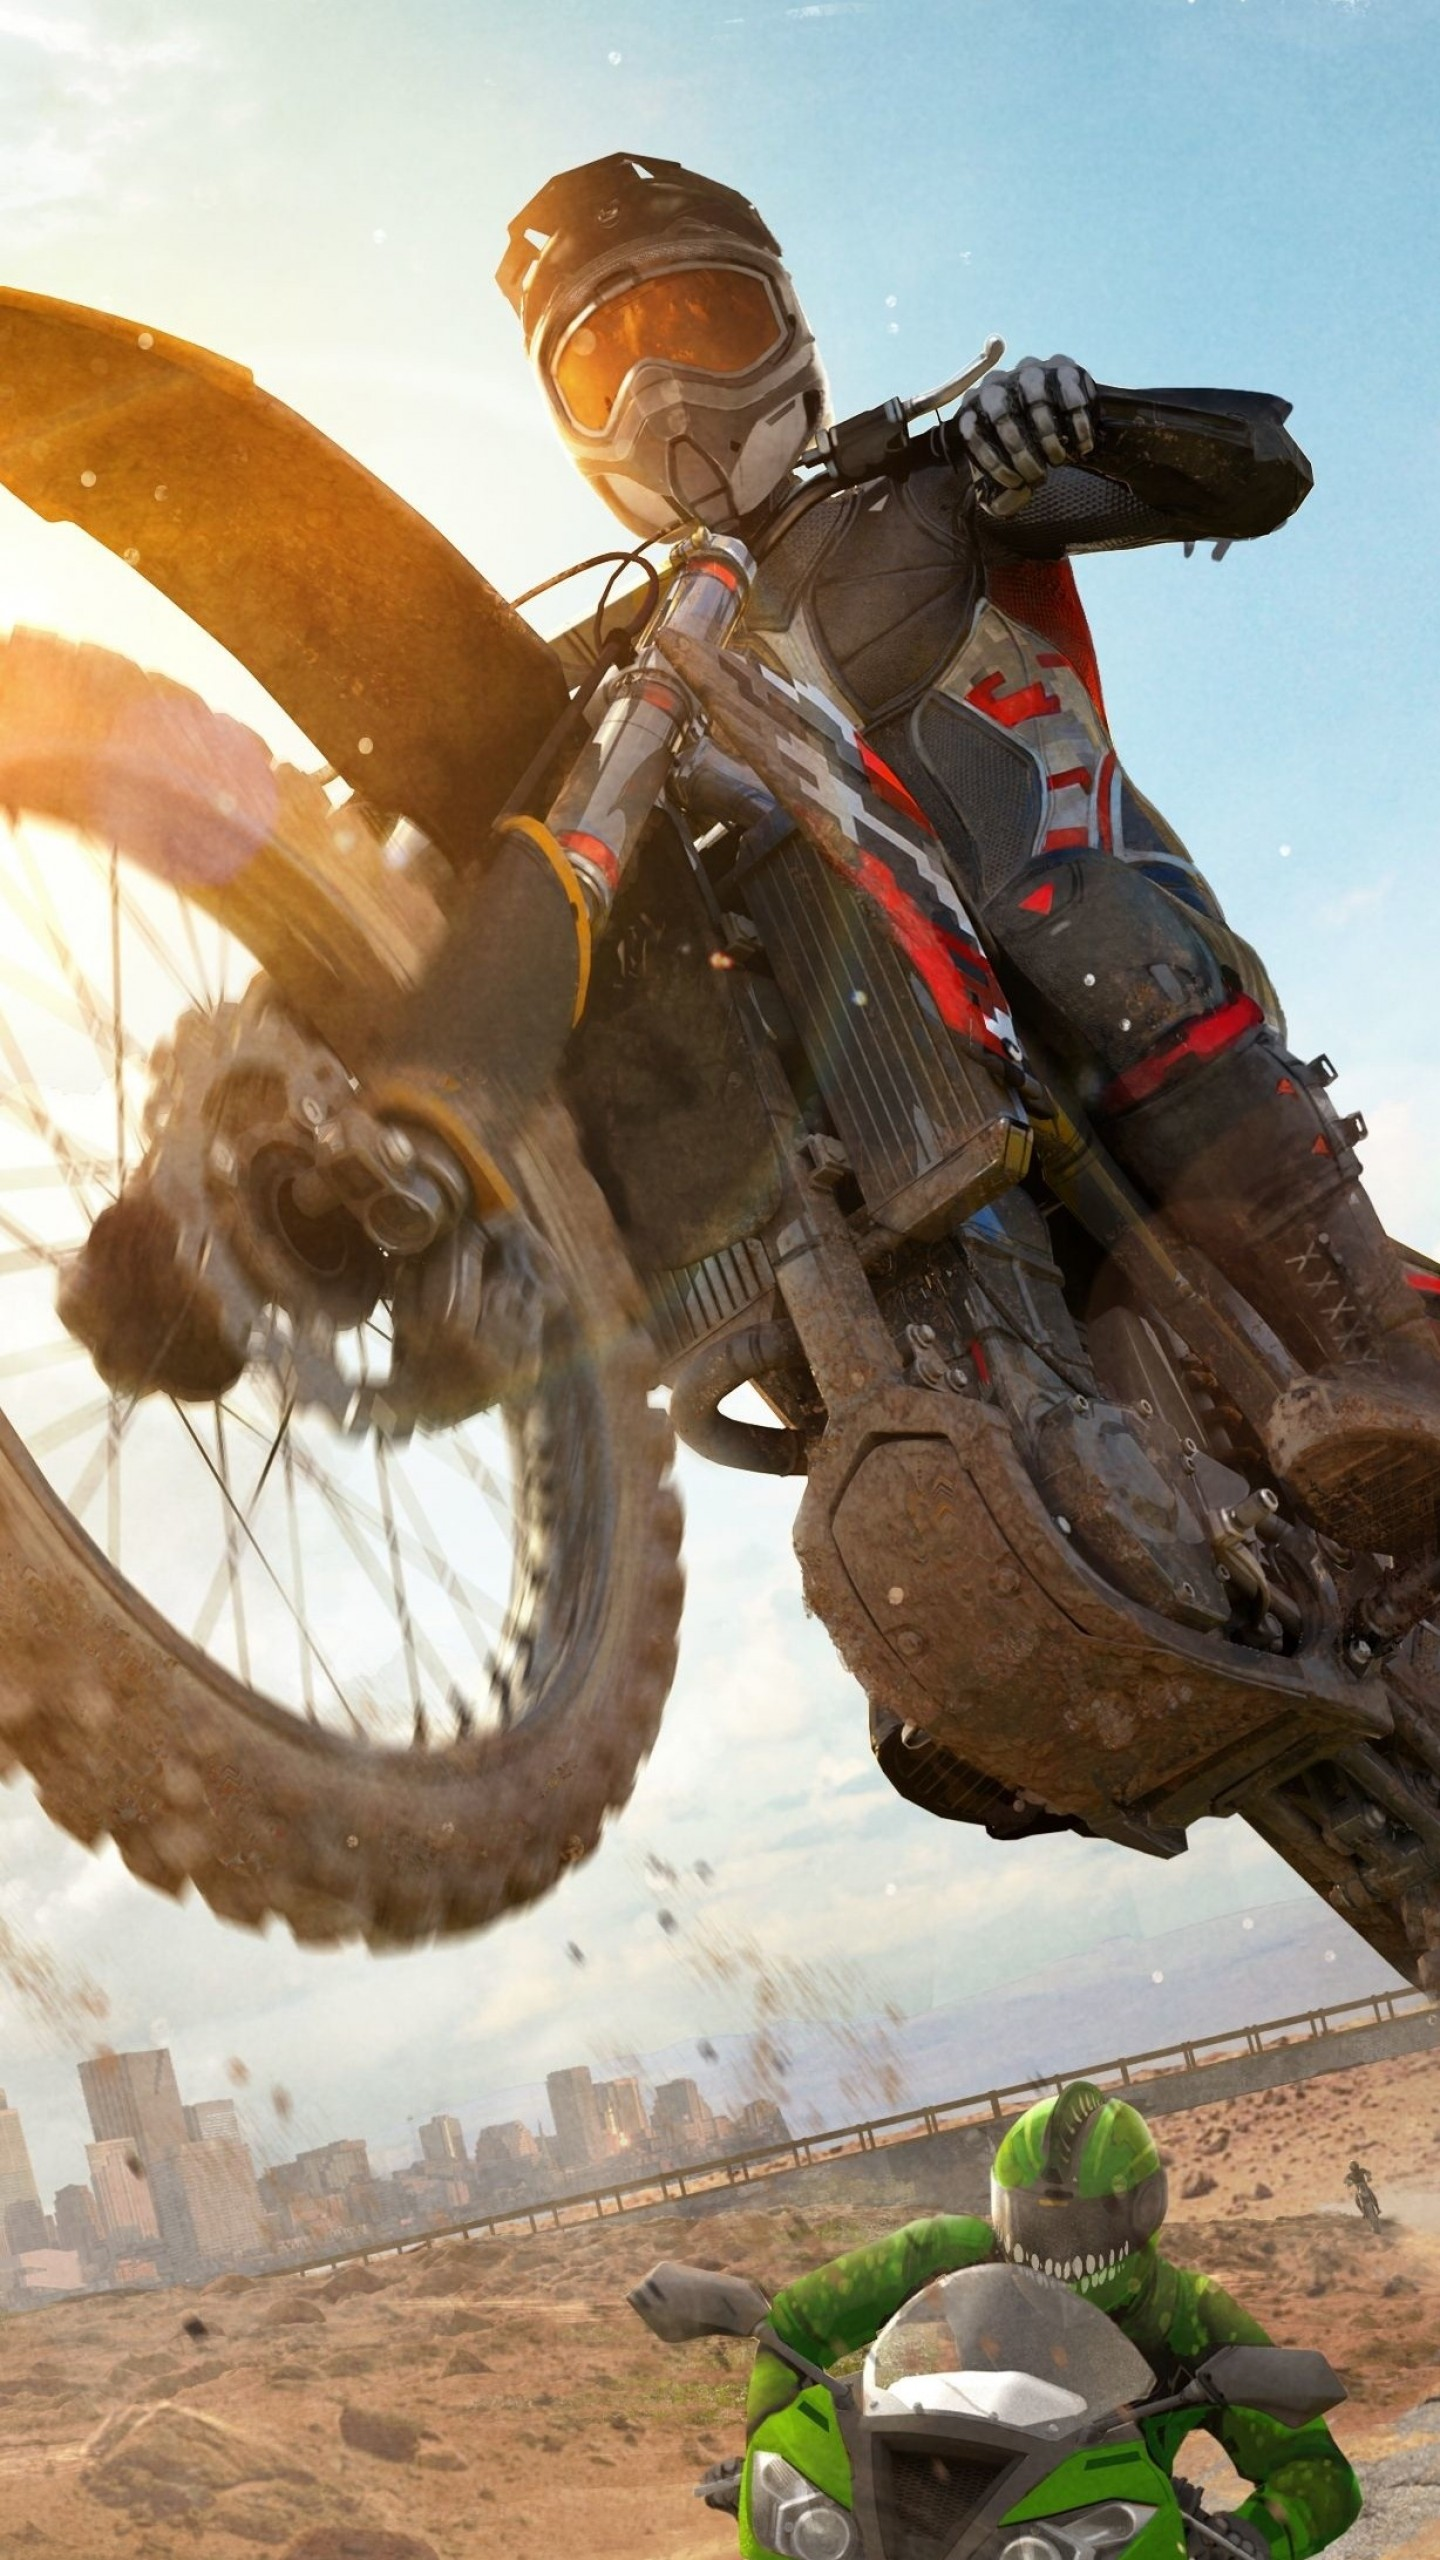 Wallpaper Moto Racer 4 Gamescom 2016 Race Bikes Best